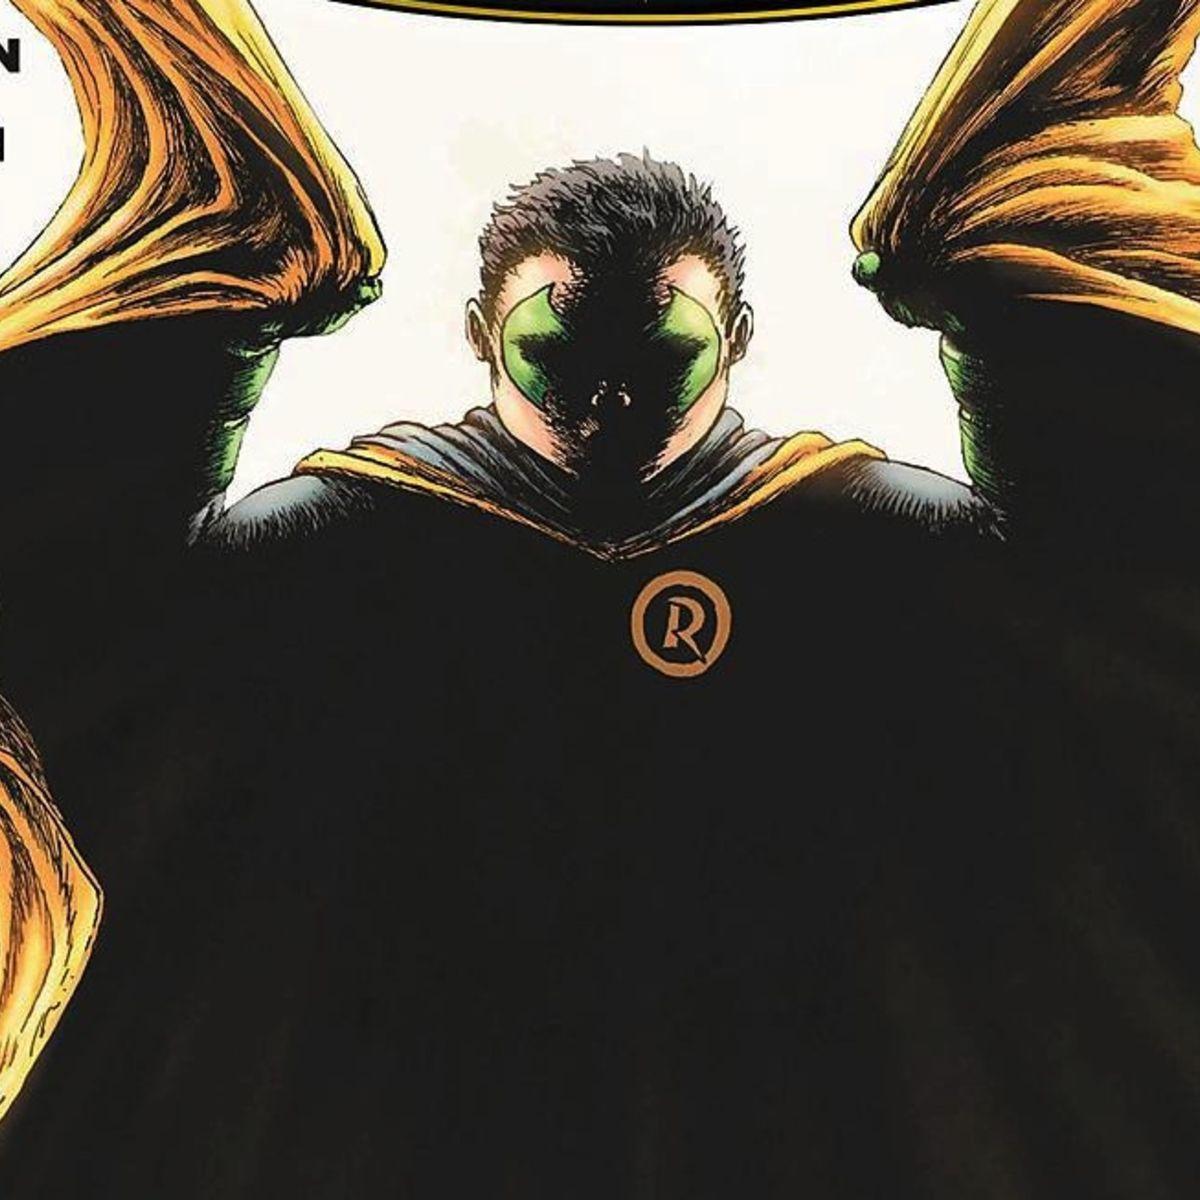 batmancoverdaeth.jpg